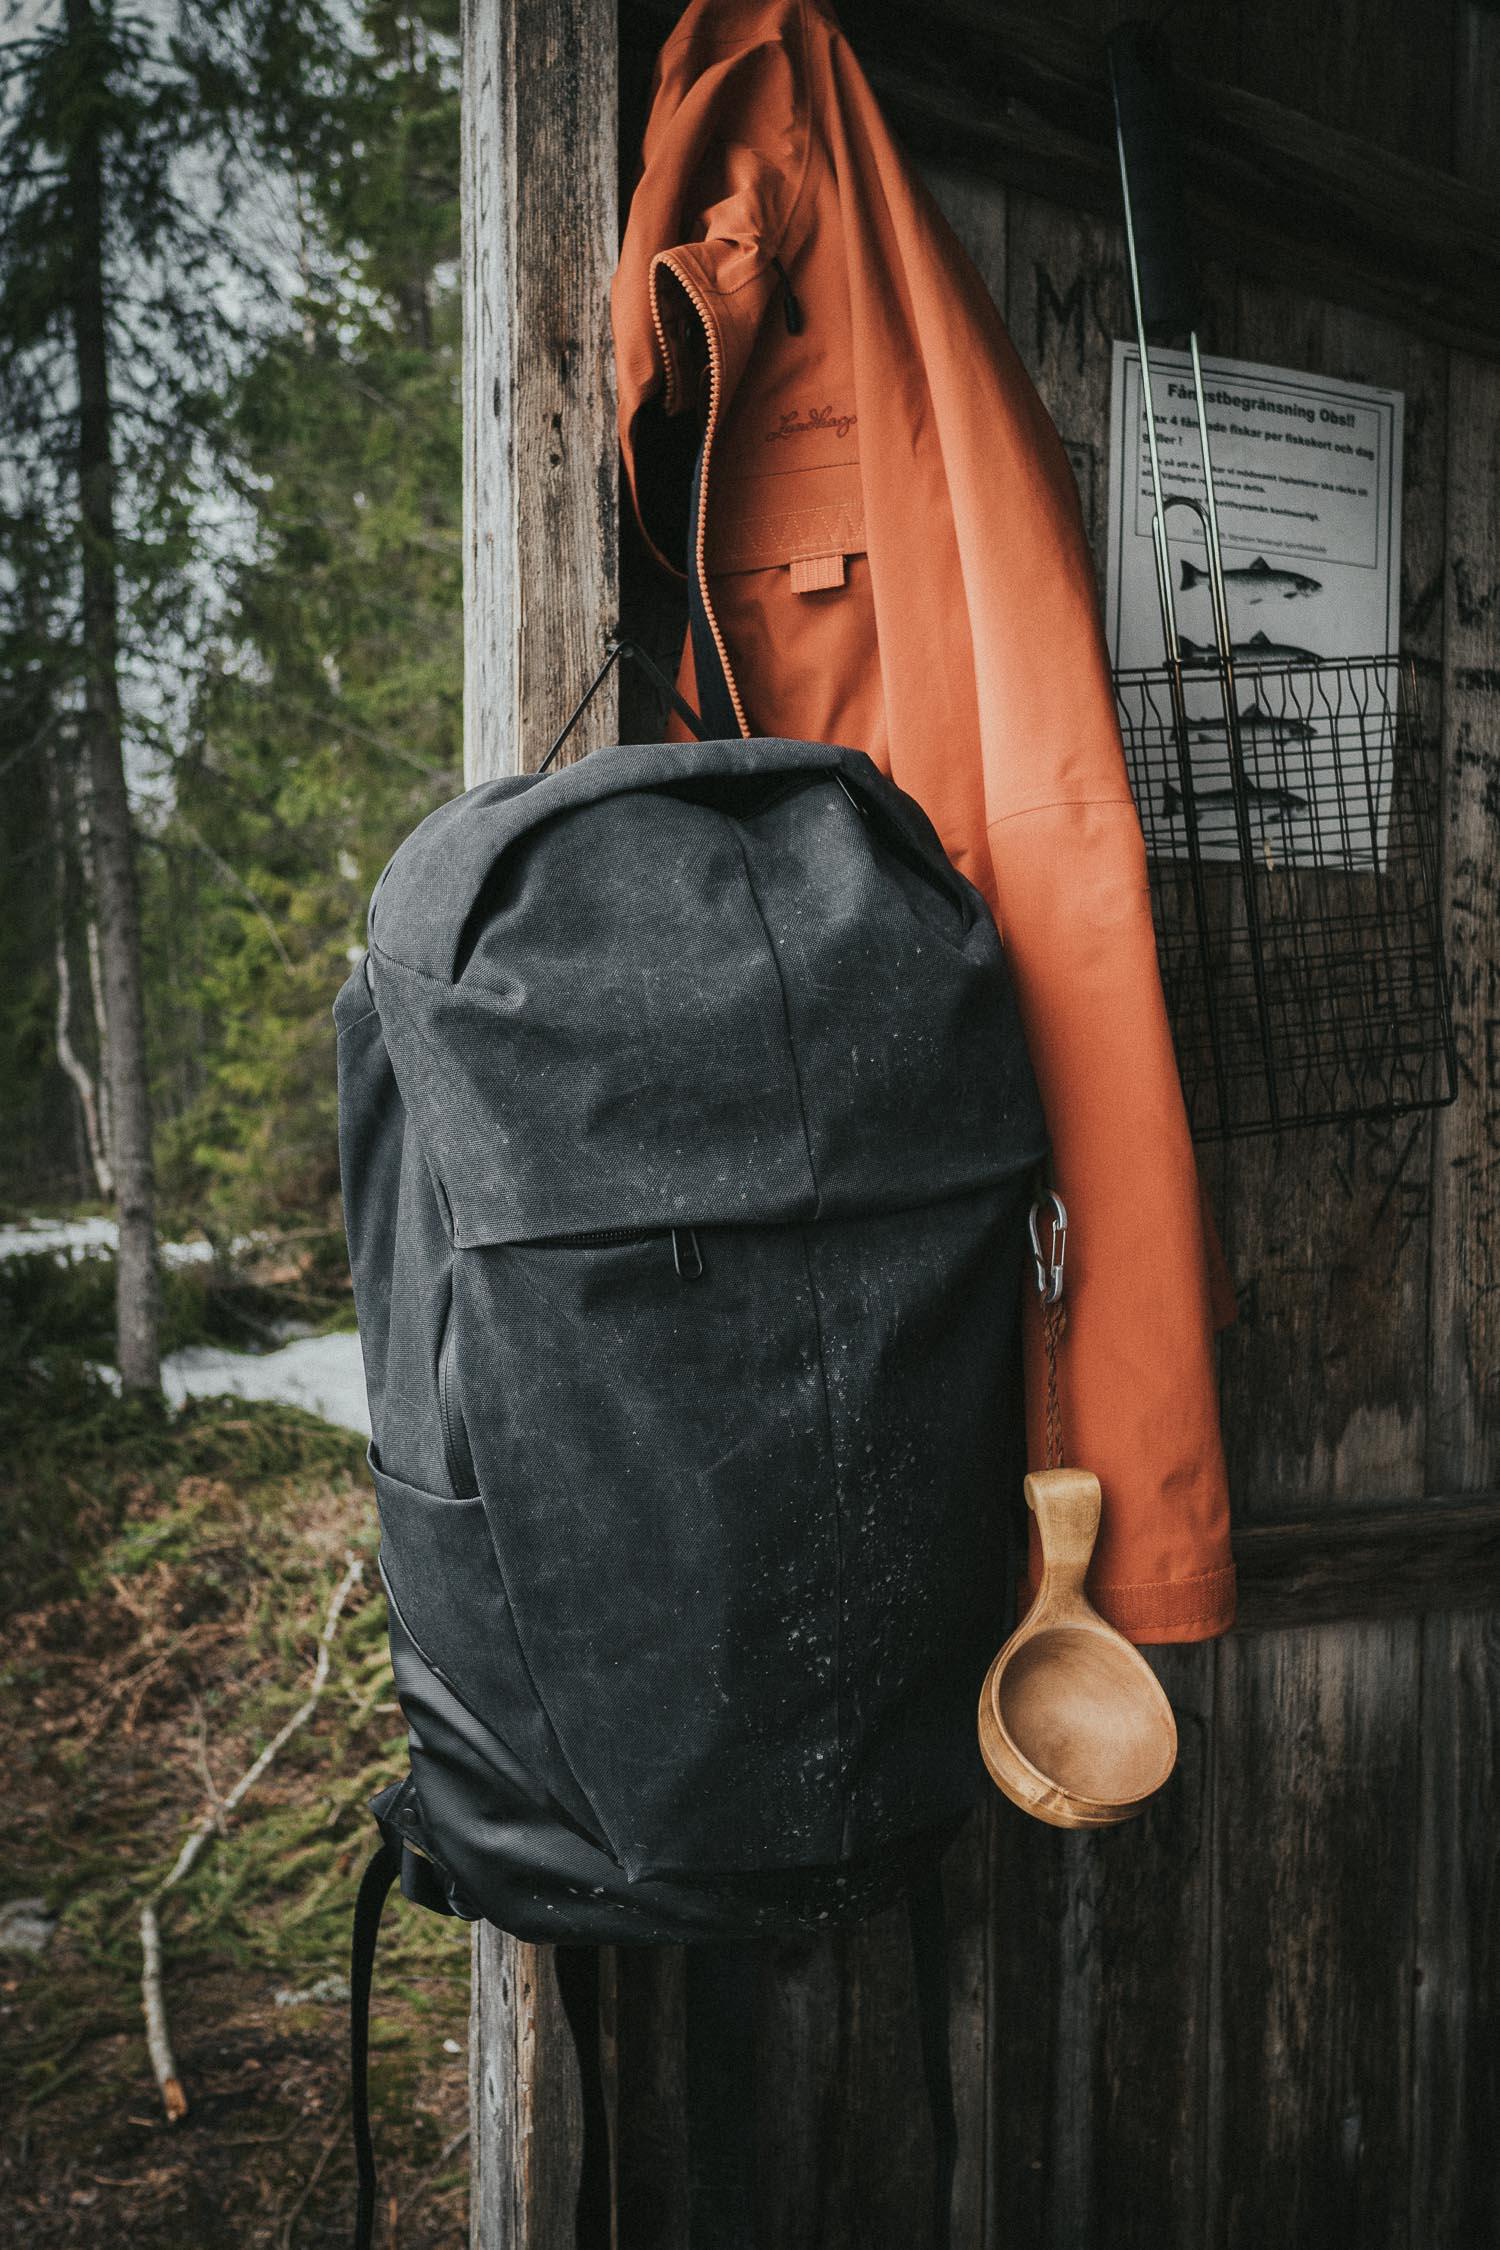 Backpack & jacket hanging in a shelter